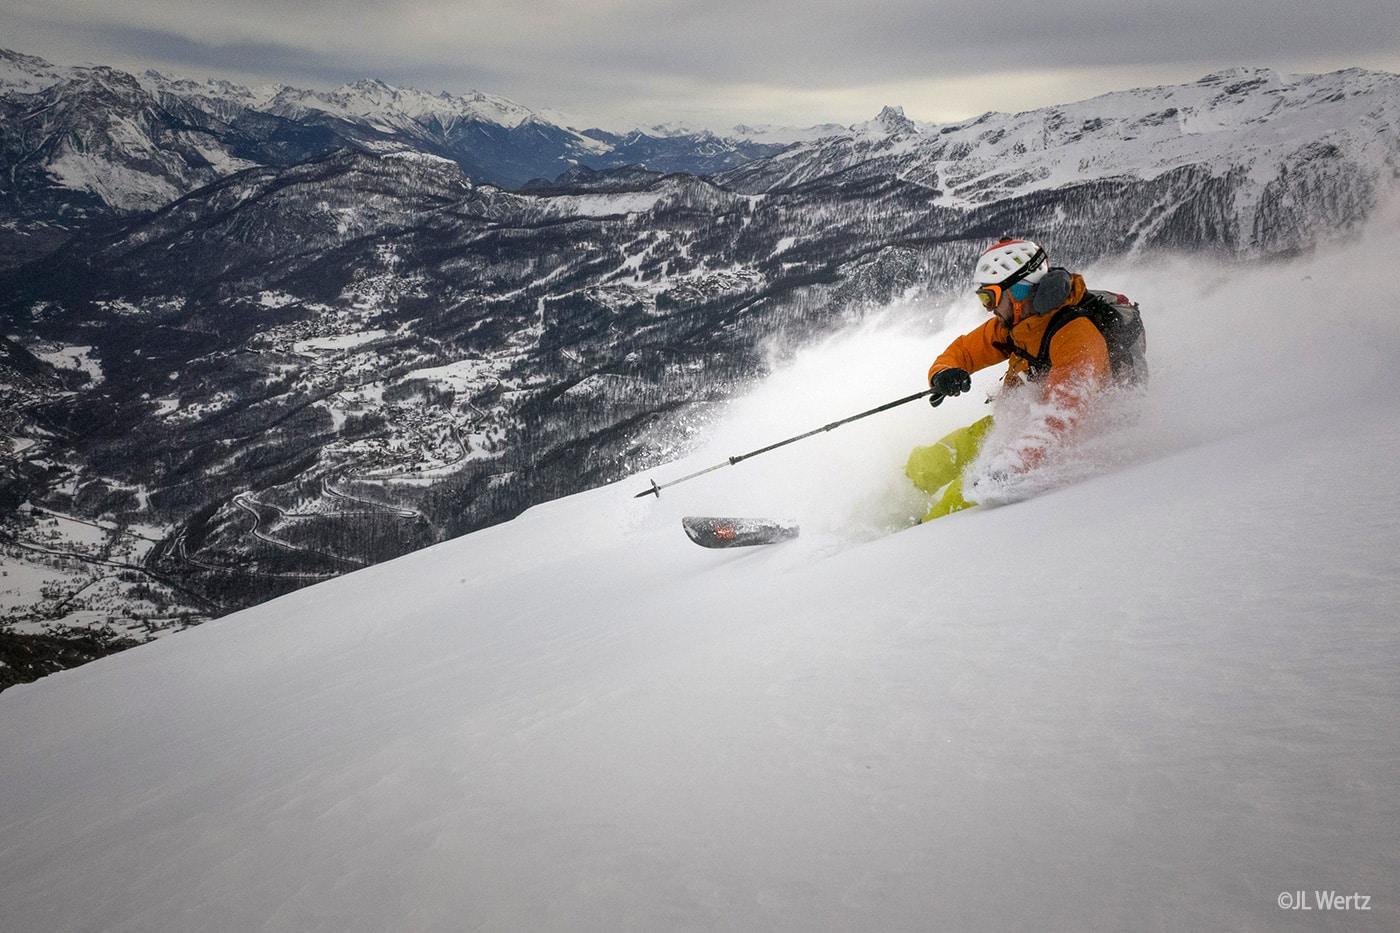 Guillaume Broust - Ski in Vallouise - @JL Wertz